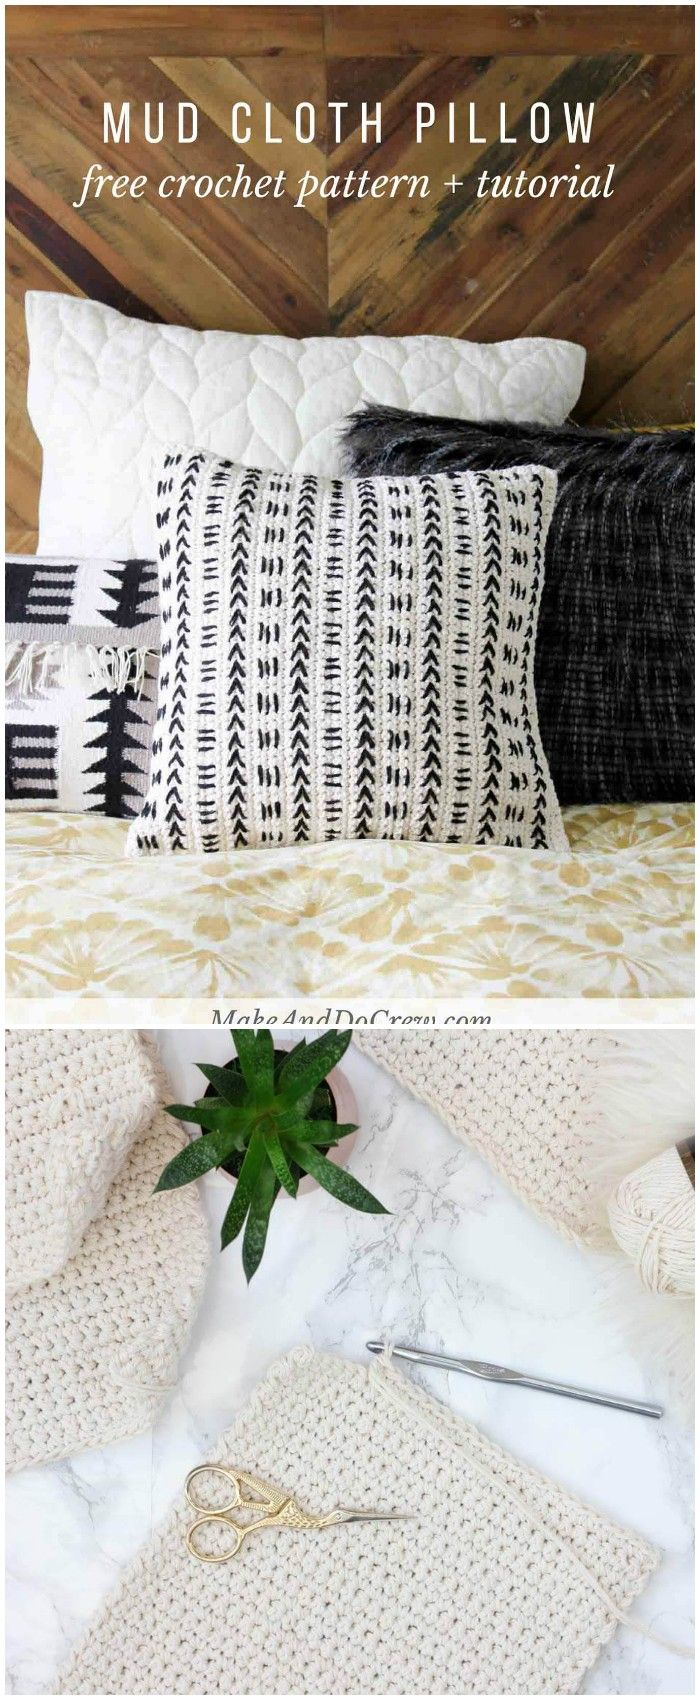 Best 25 crochet pillow patterns free ideas on pinterest crochet best 25 crochet pillow patterns free ideas on pinterest crochet pillow pattern crochet cushion pattern and crochet pillow bankloansurffo Choice Image